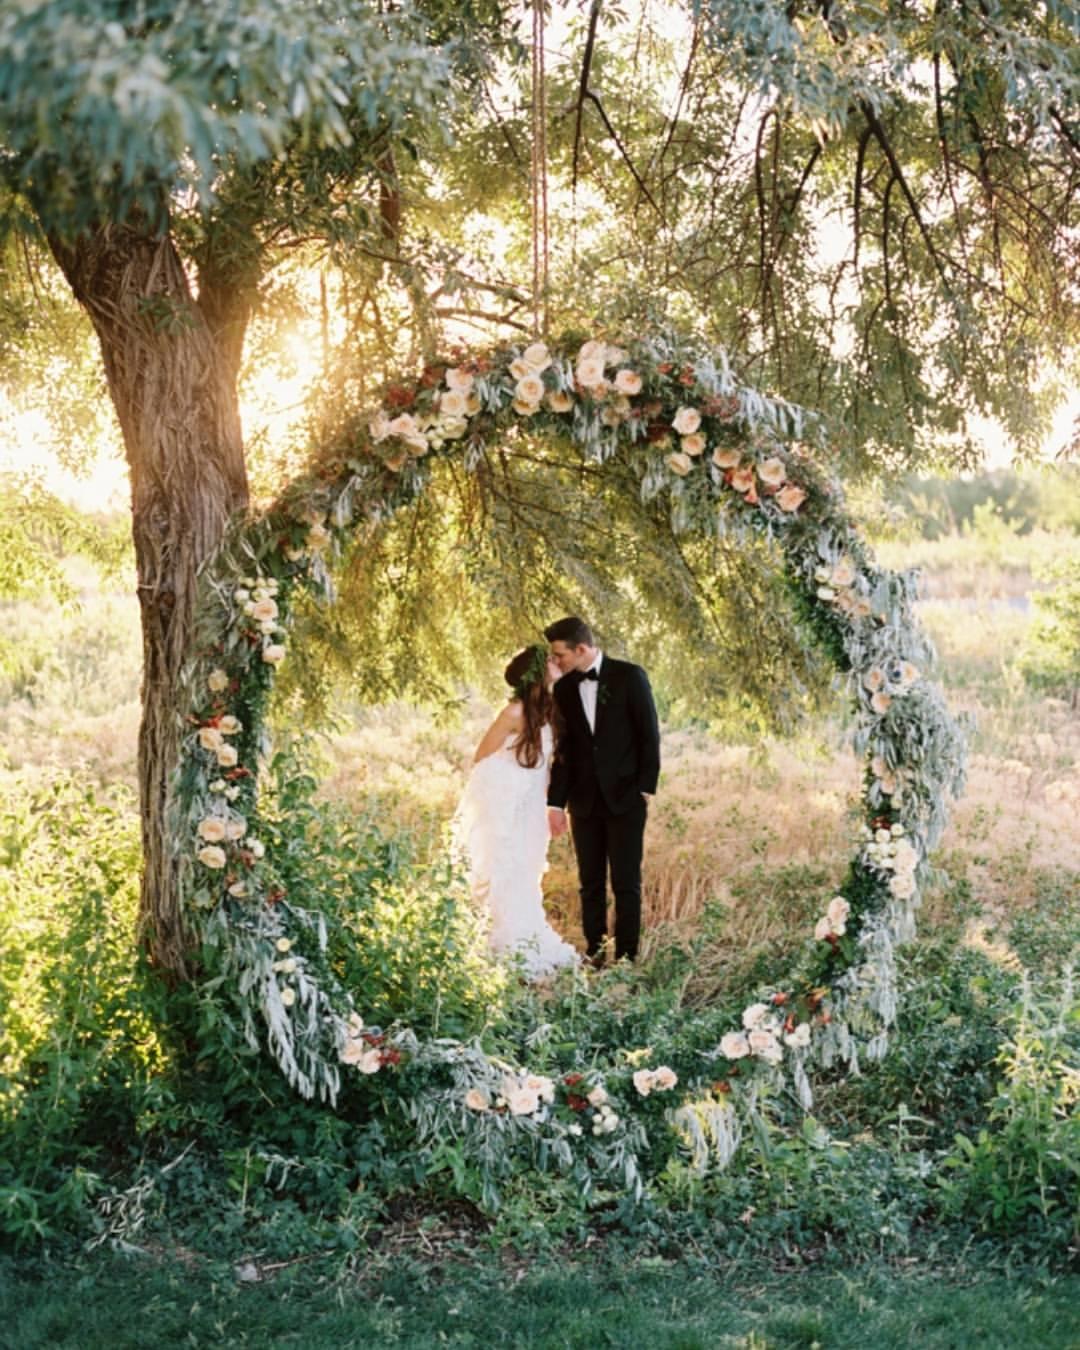 Wedding Arbor Circle: 5 Unique And Personalized Wedding Arch Ideas